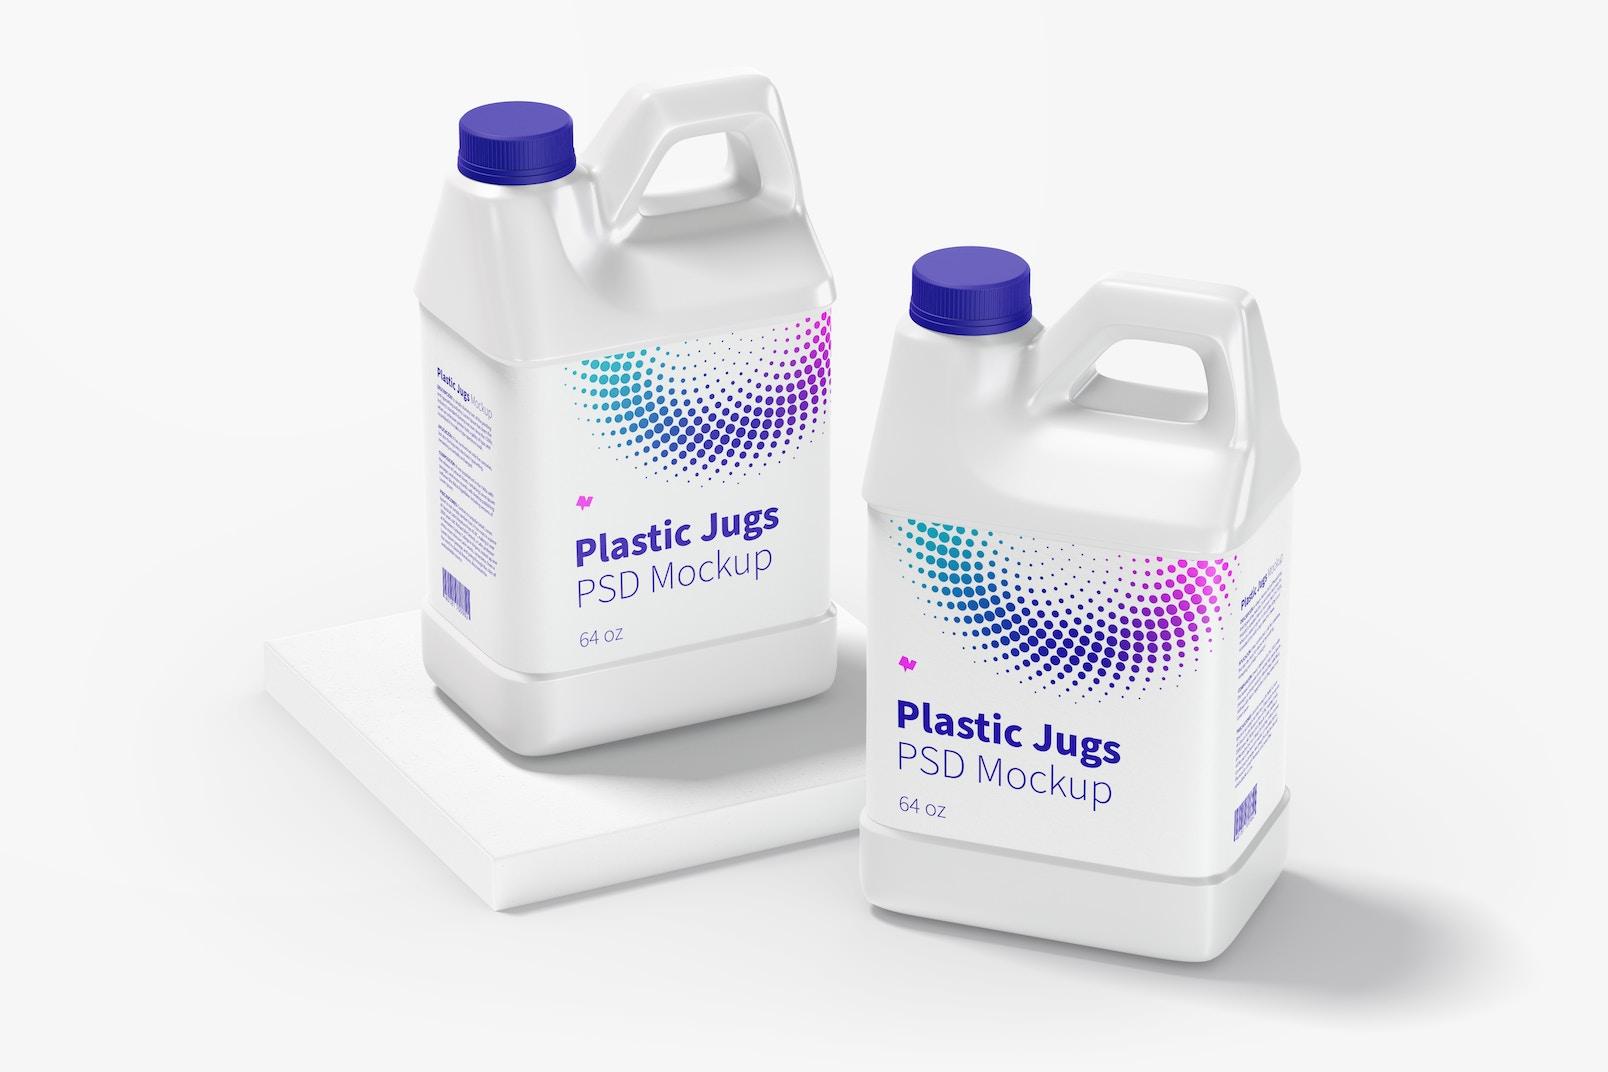 64 oz Plastic Jugs Mockup, Perspective